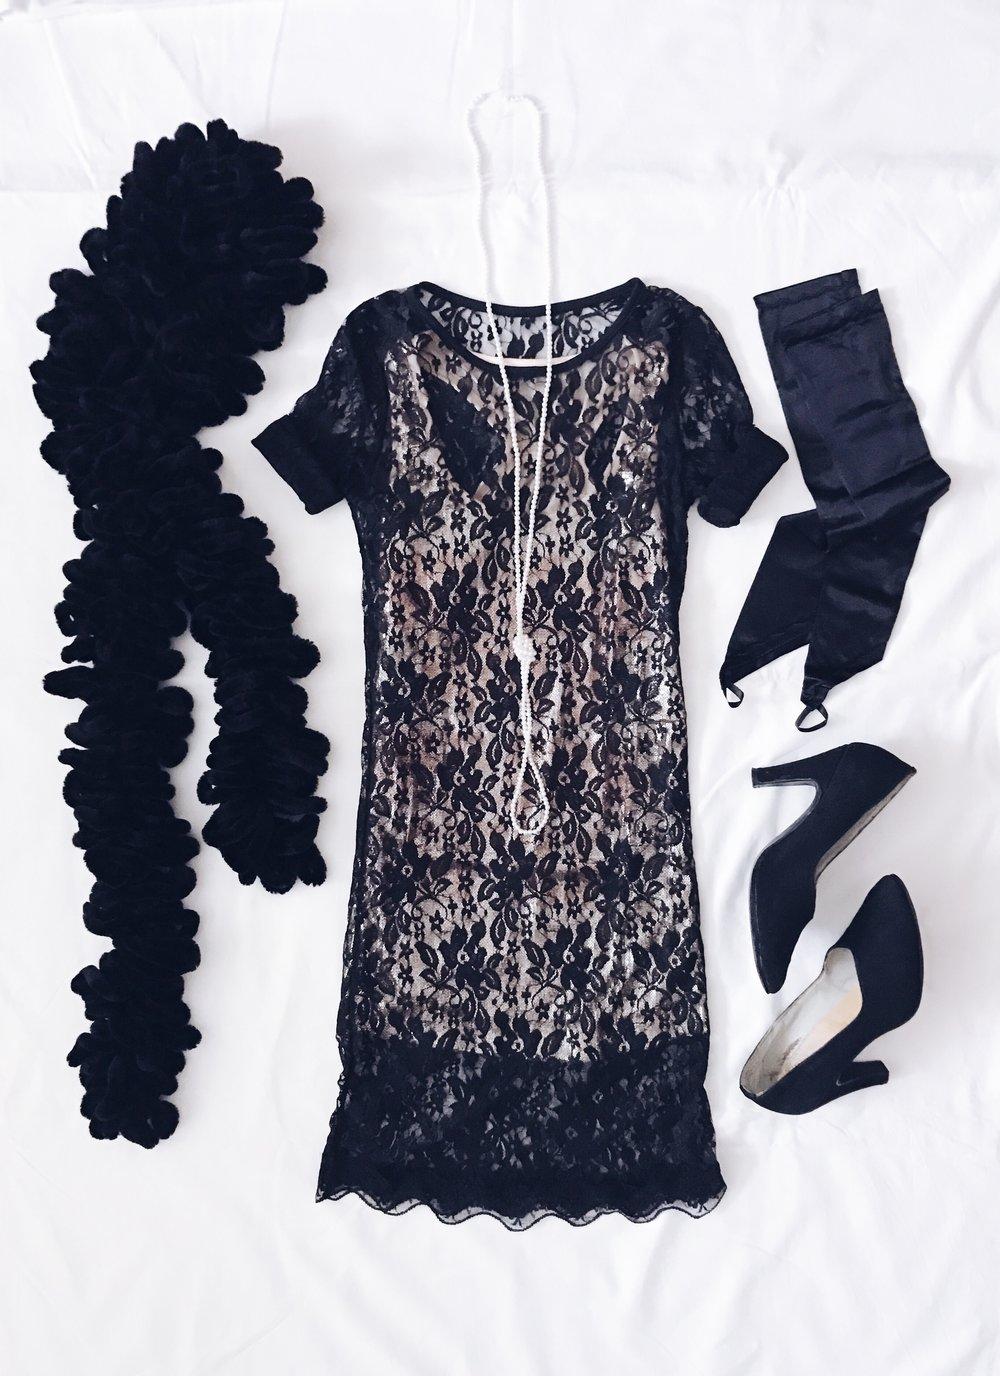 Дантелена рокля: Shein  Потник с пайети: Terranova style